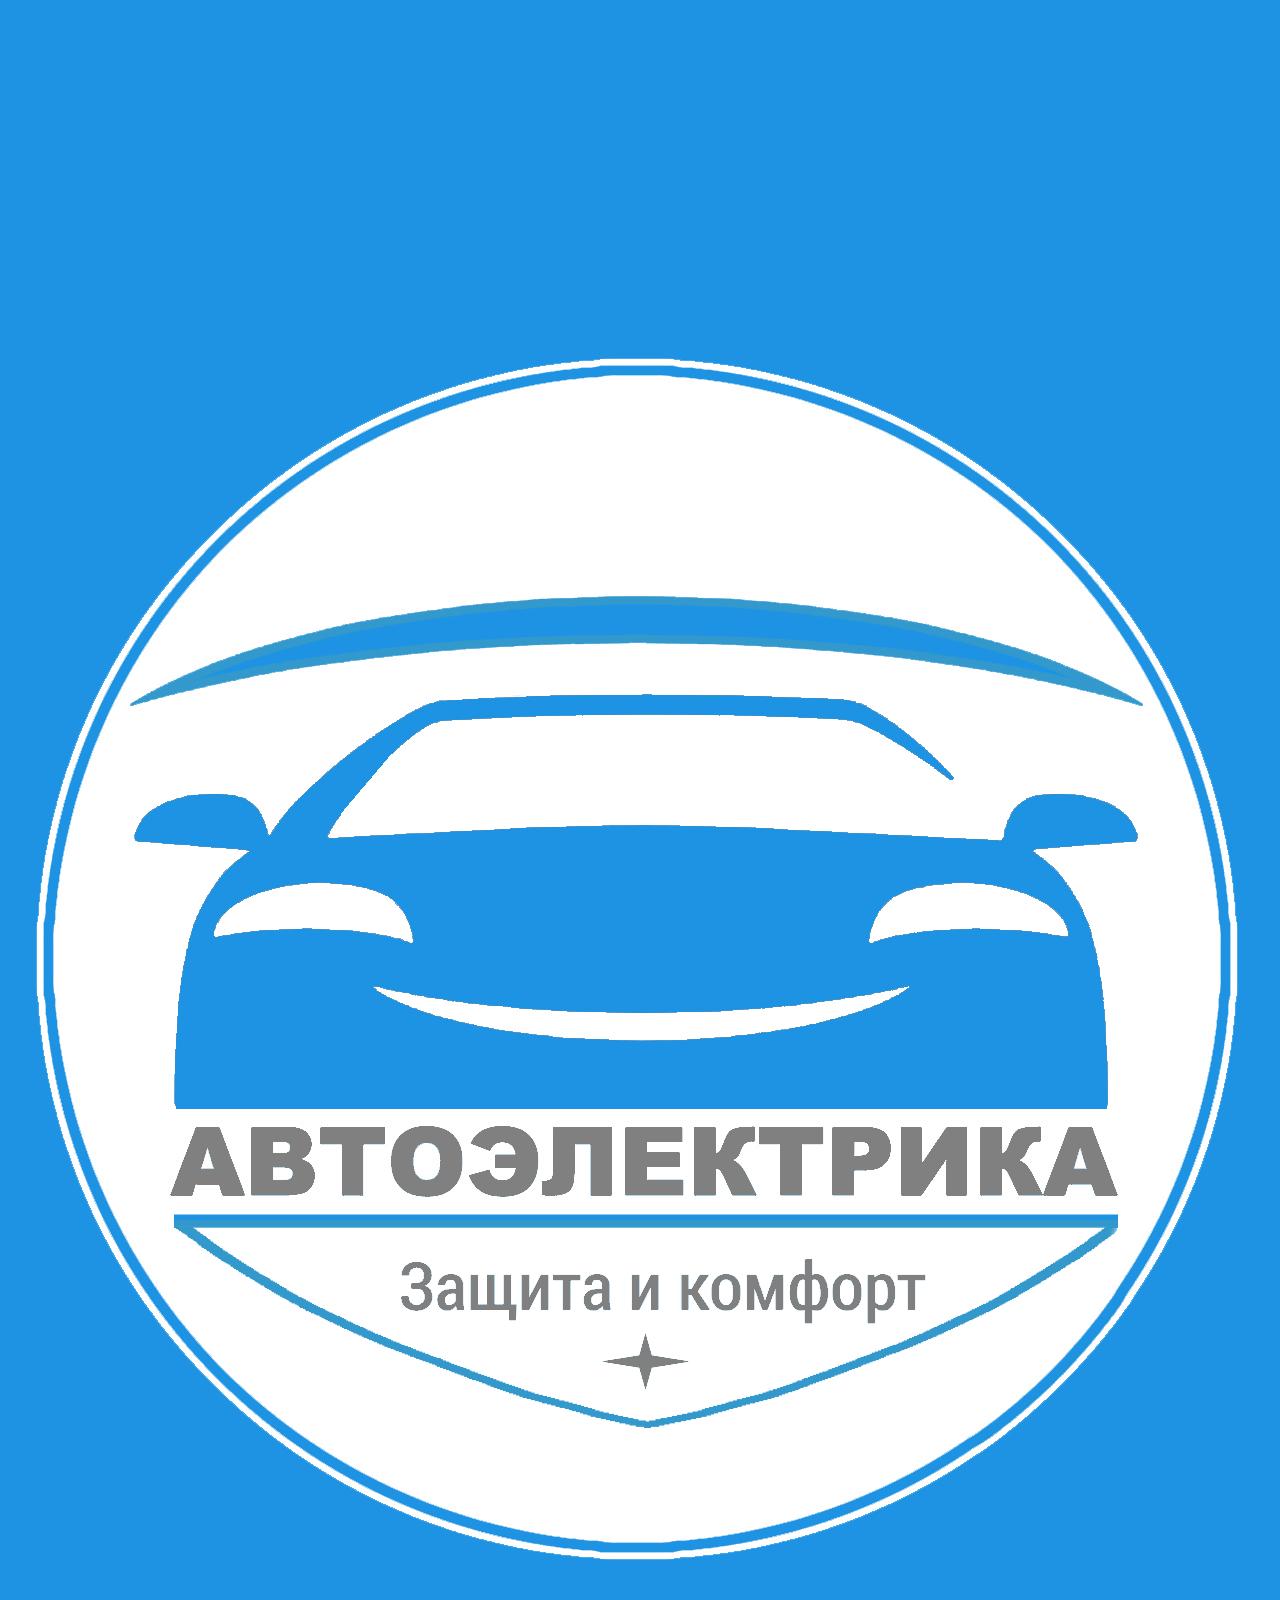 Автоэлектрика